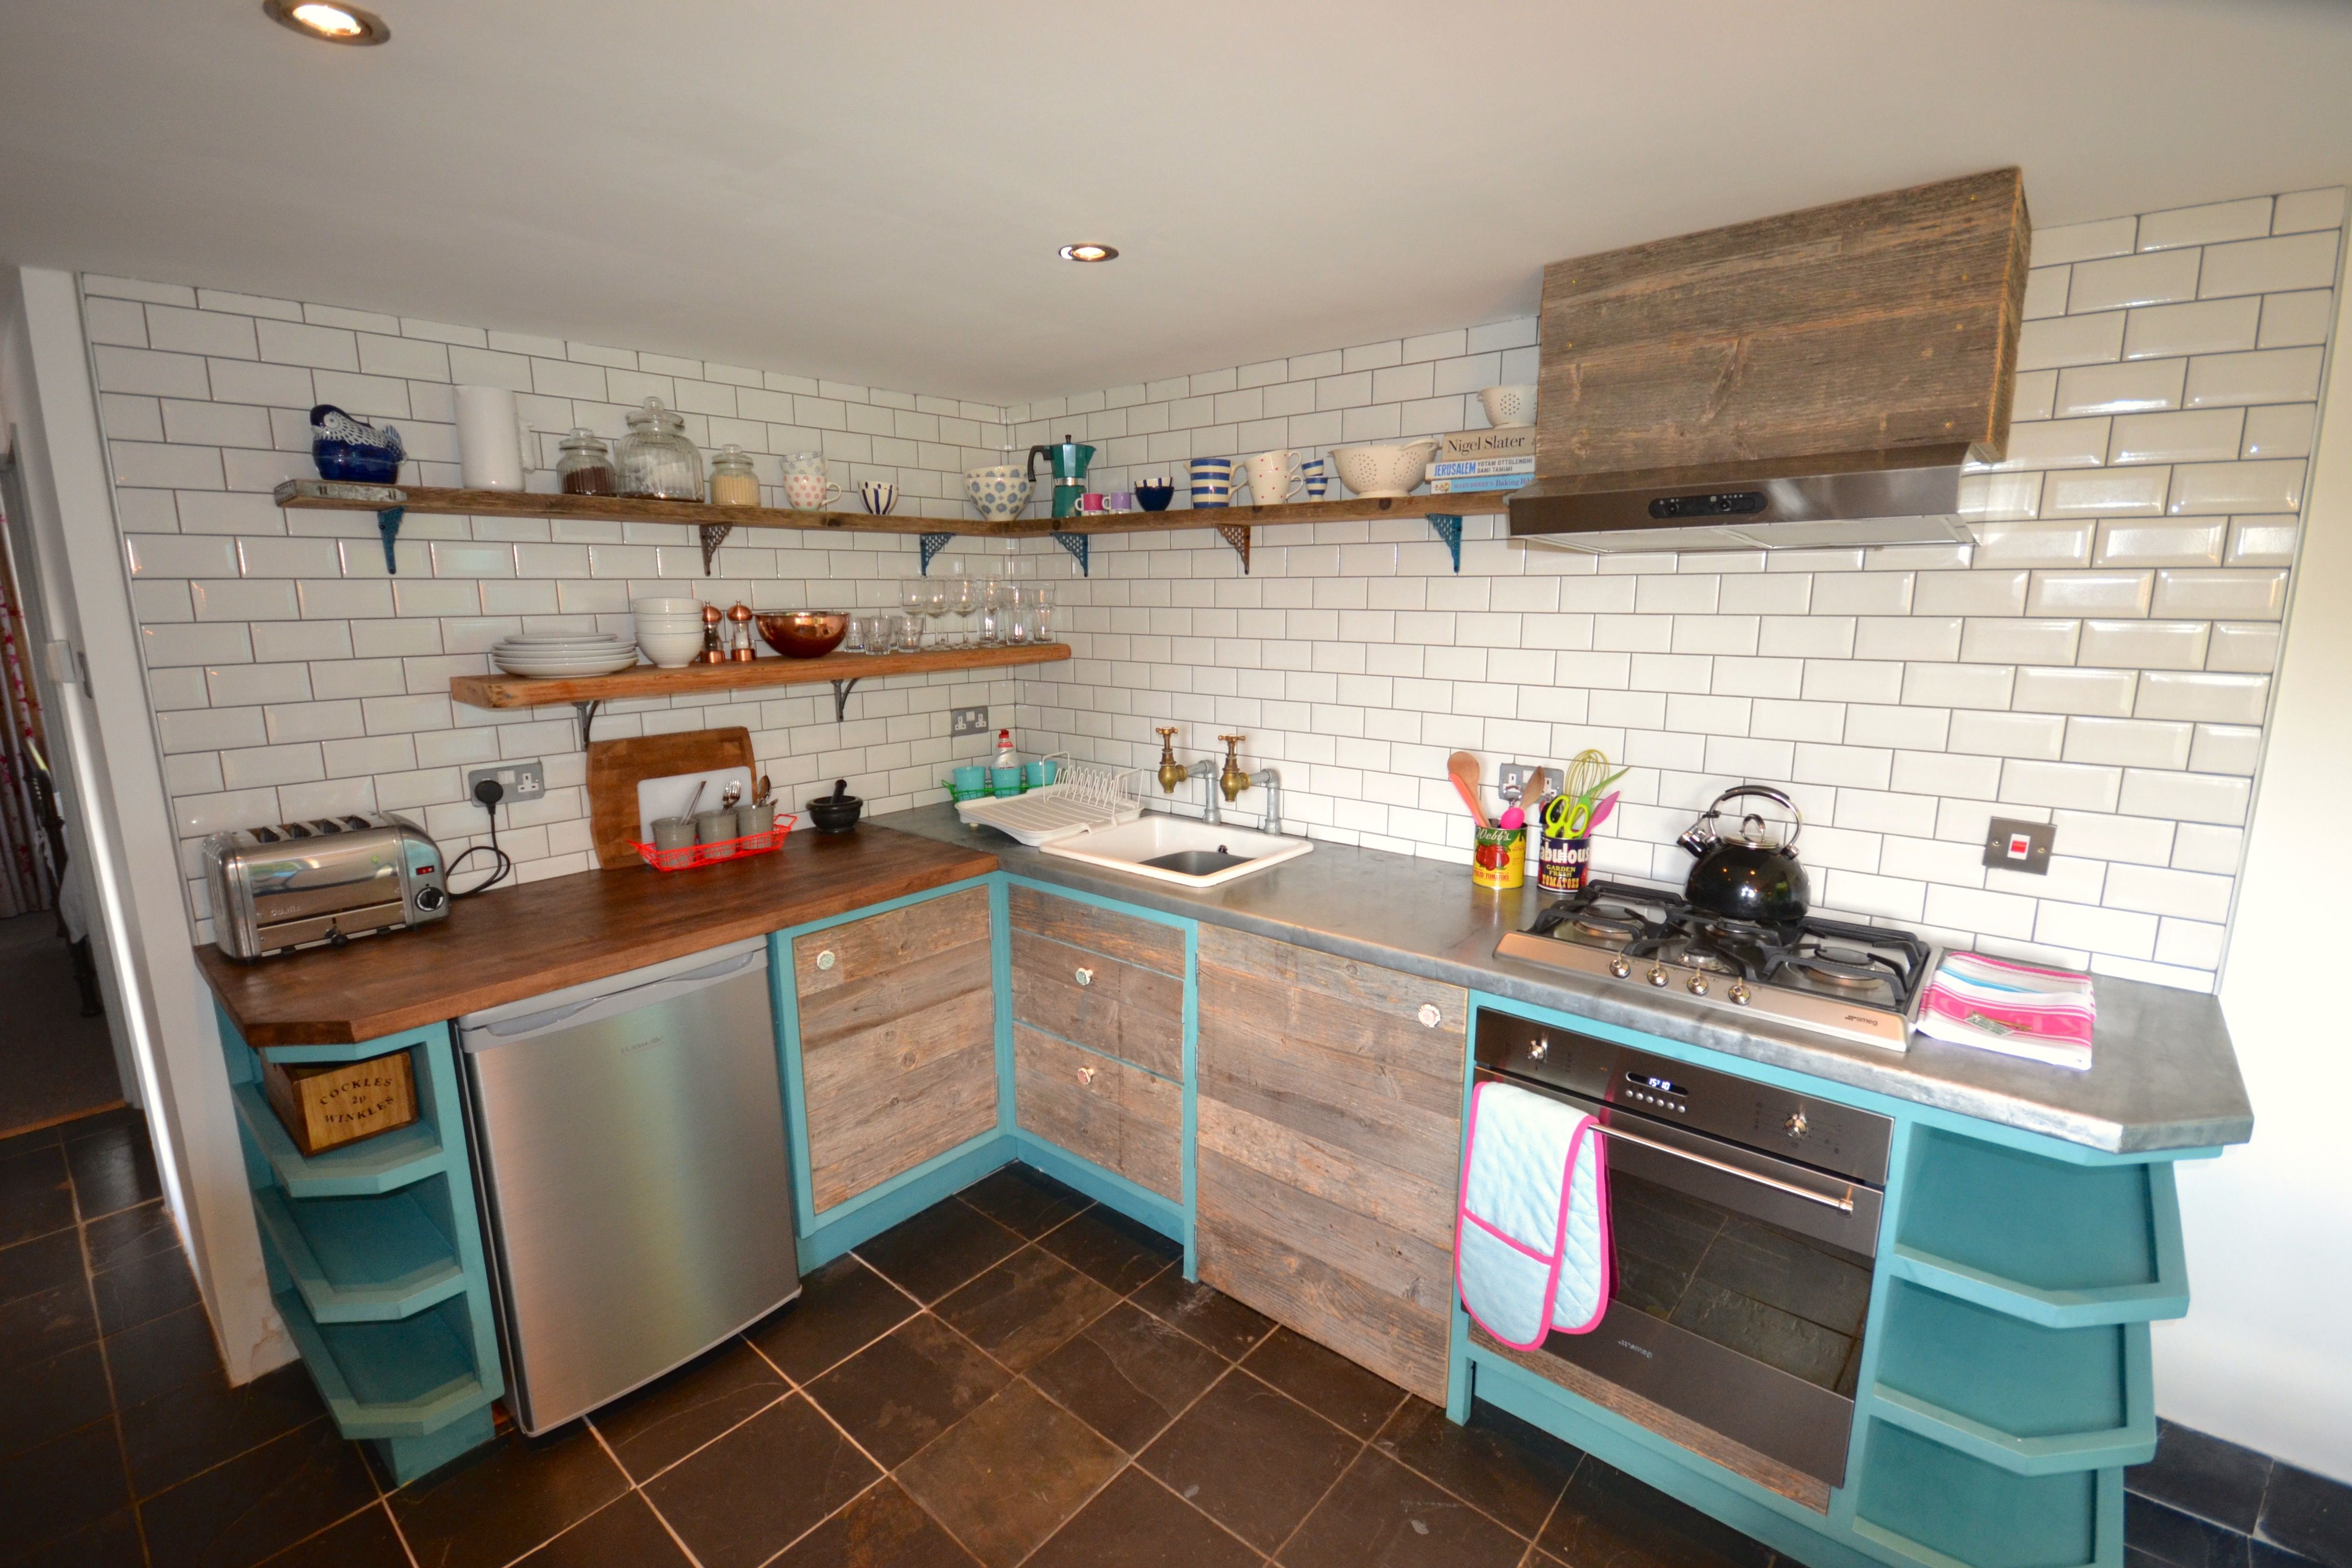 Bespoke cornwall kitchen with zinc worktops, reclaimed timber, Annie ...